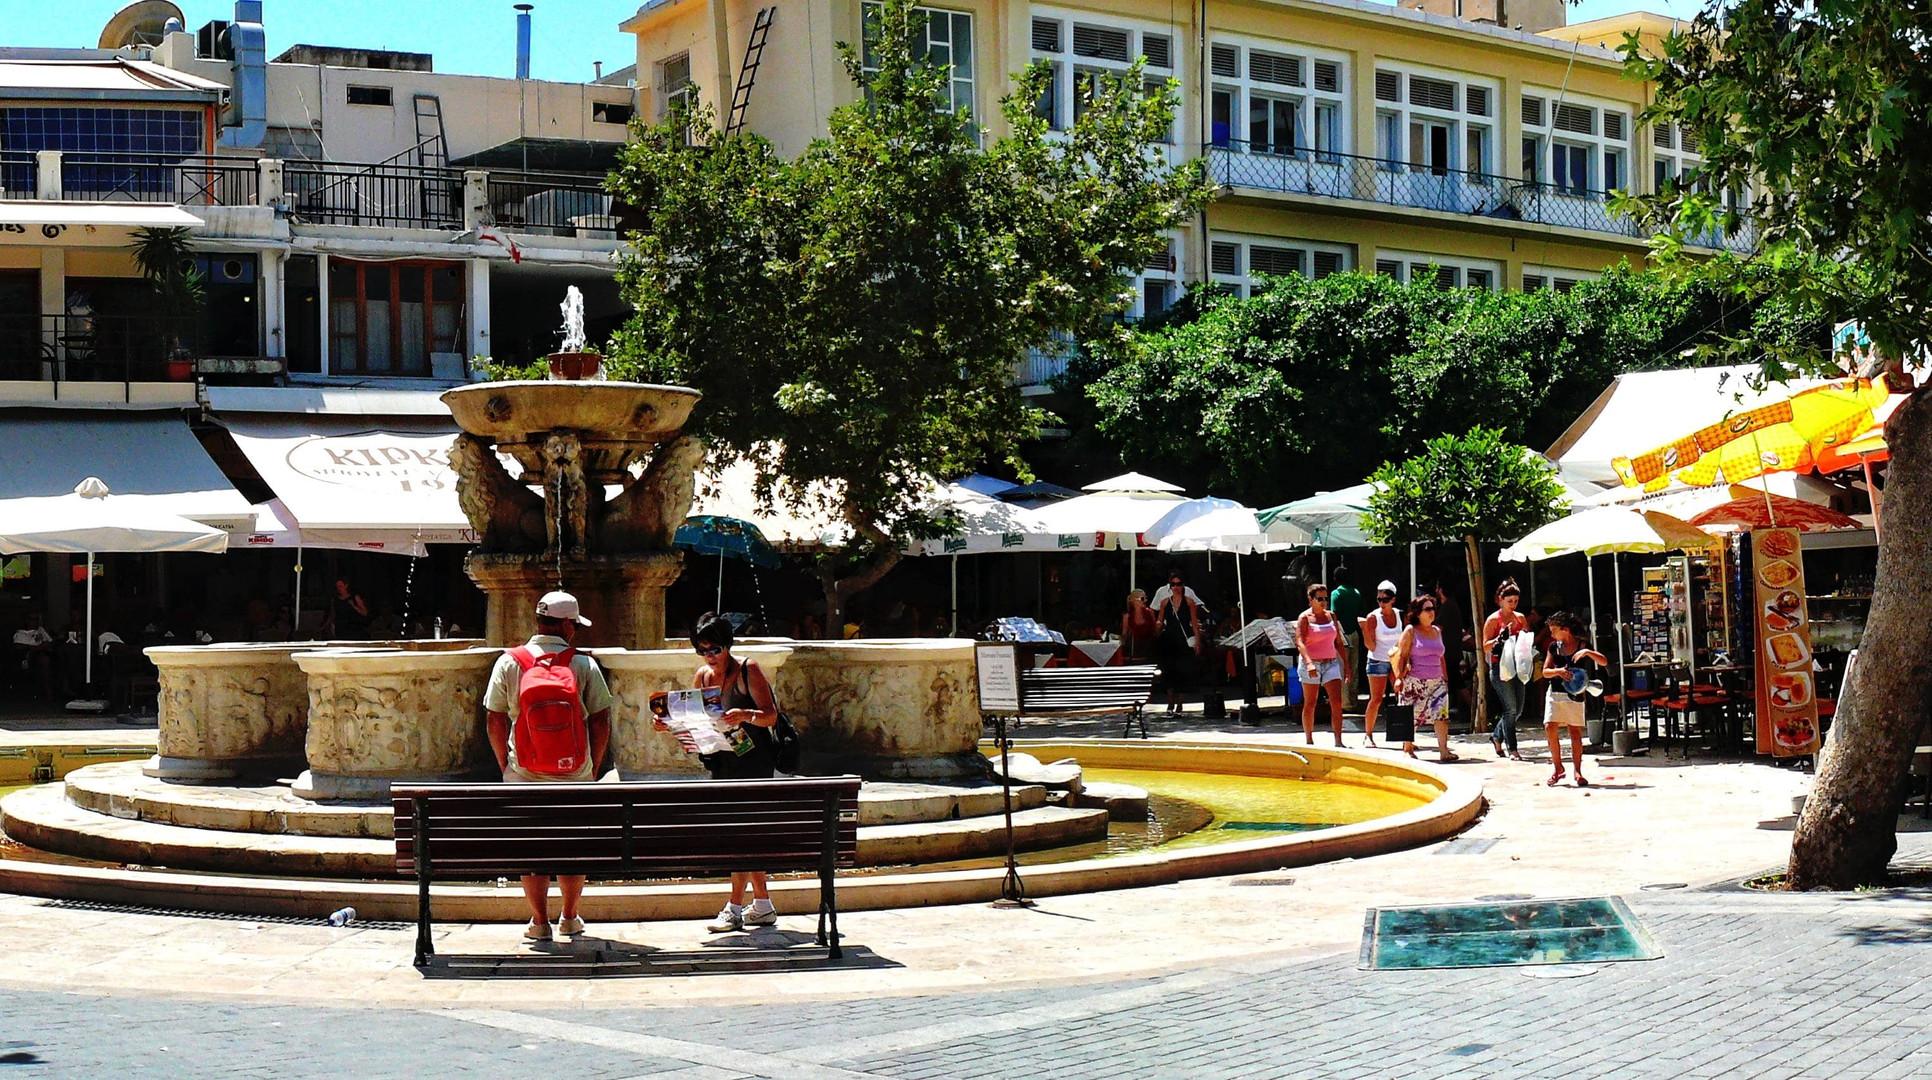 Heraklion central square